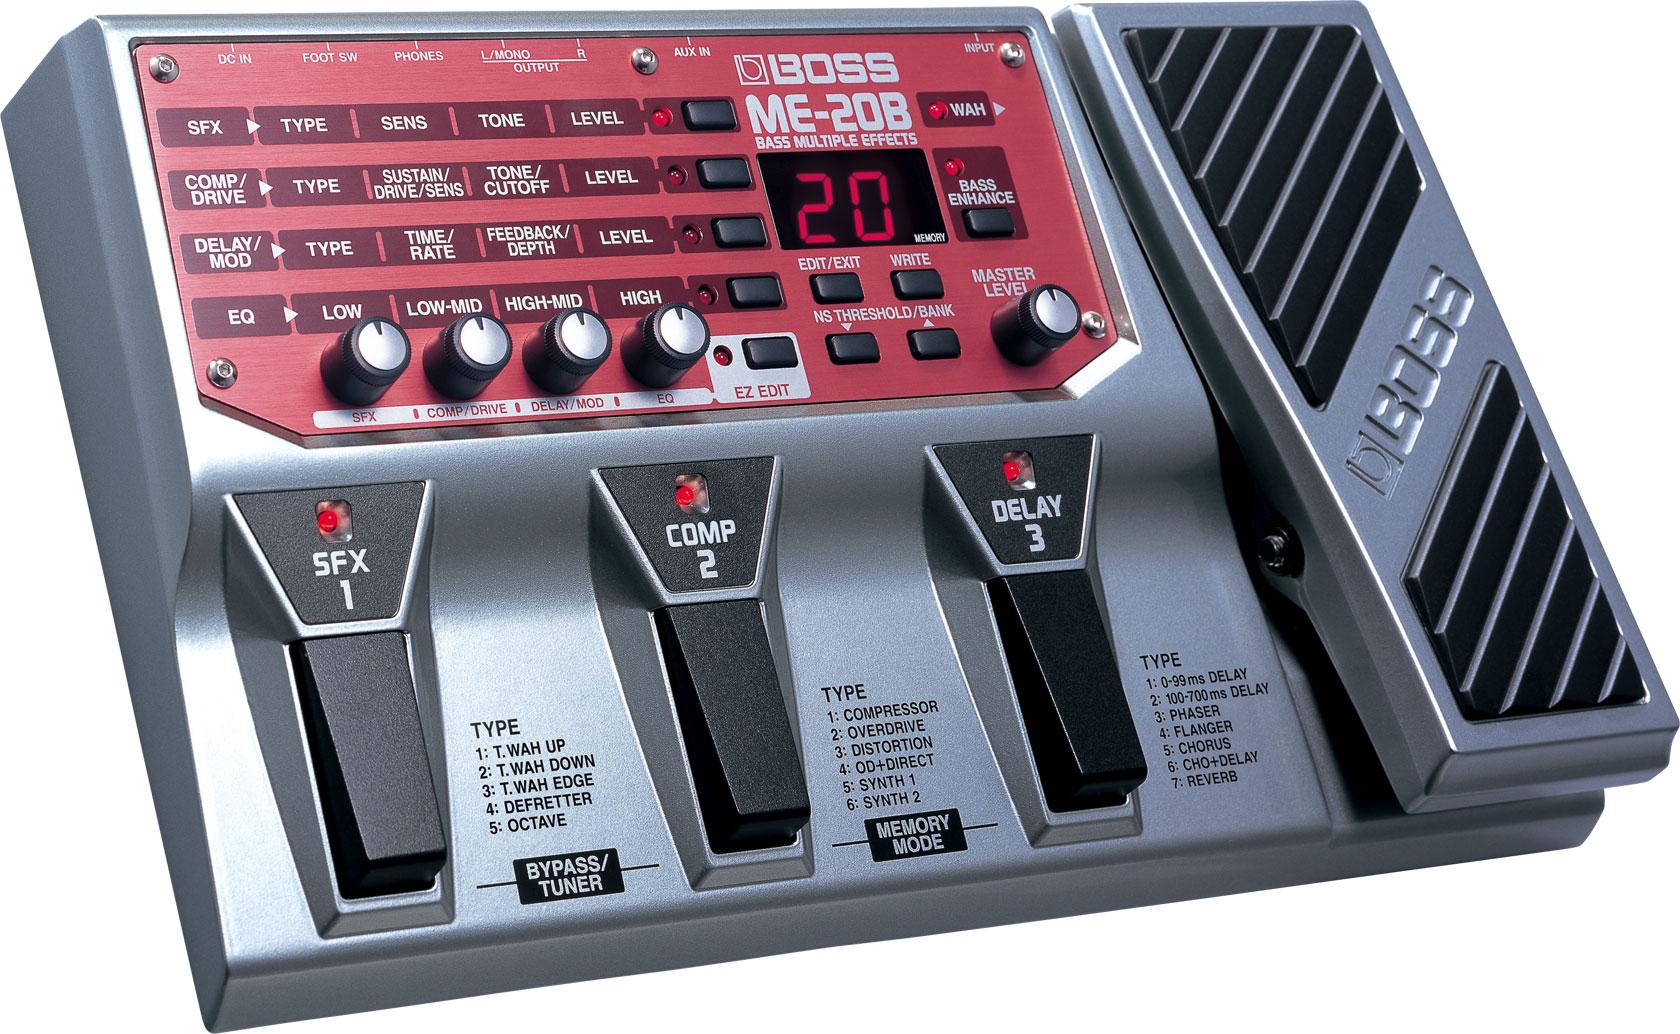 Boss ME-20B multieffects pedal.